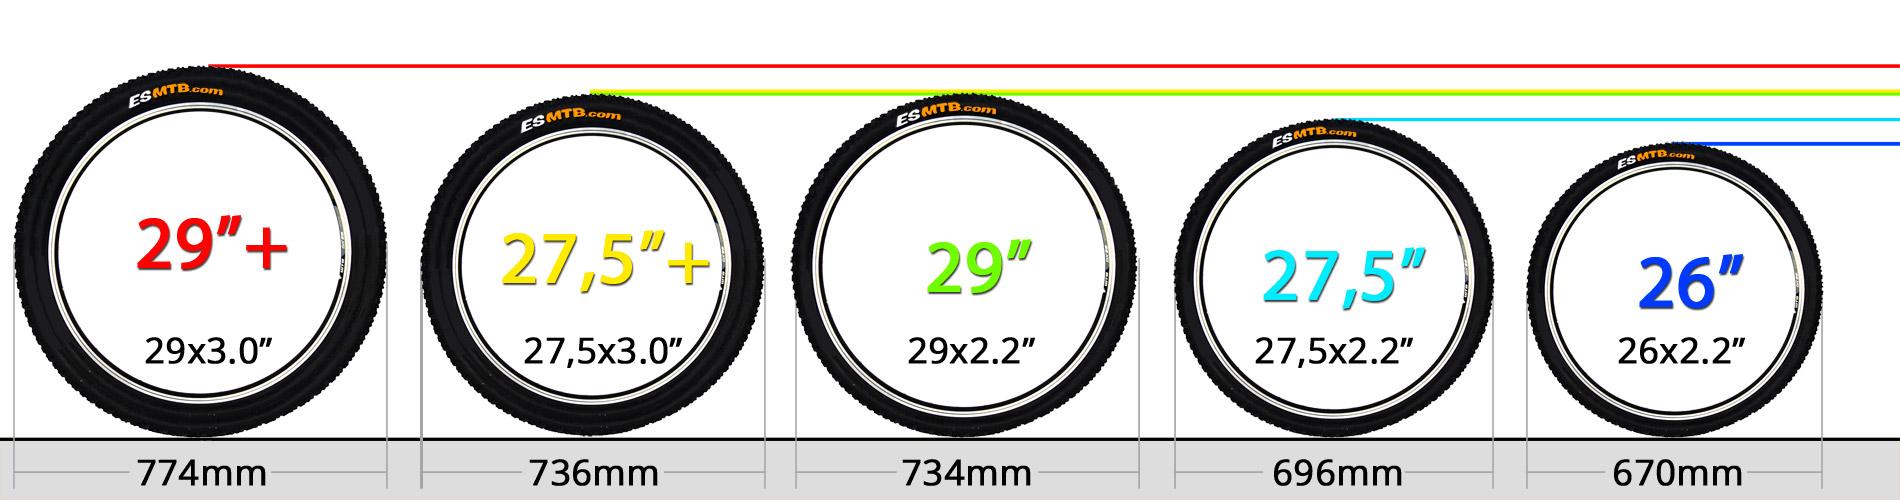 Diametro de una rueda